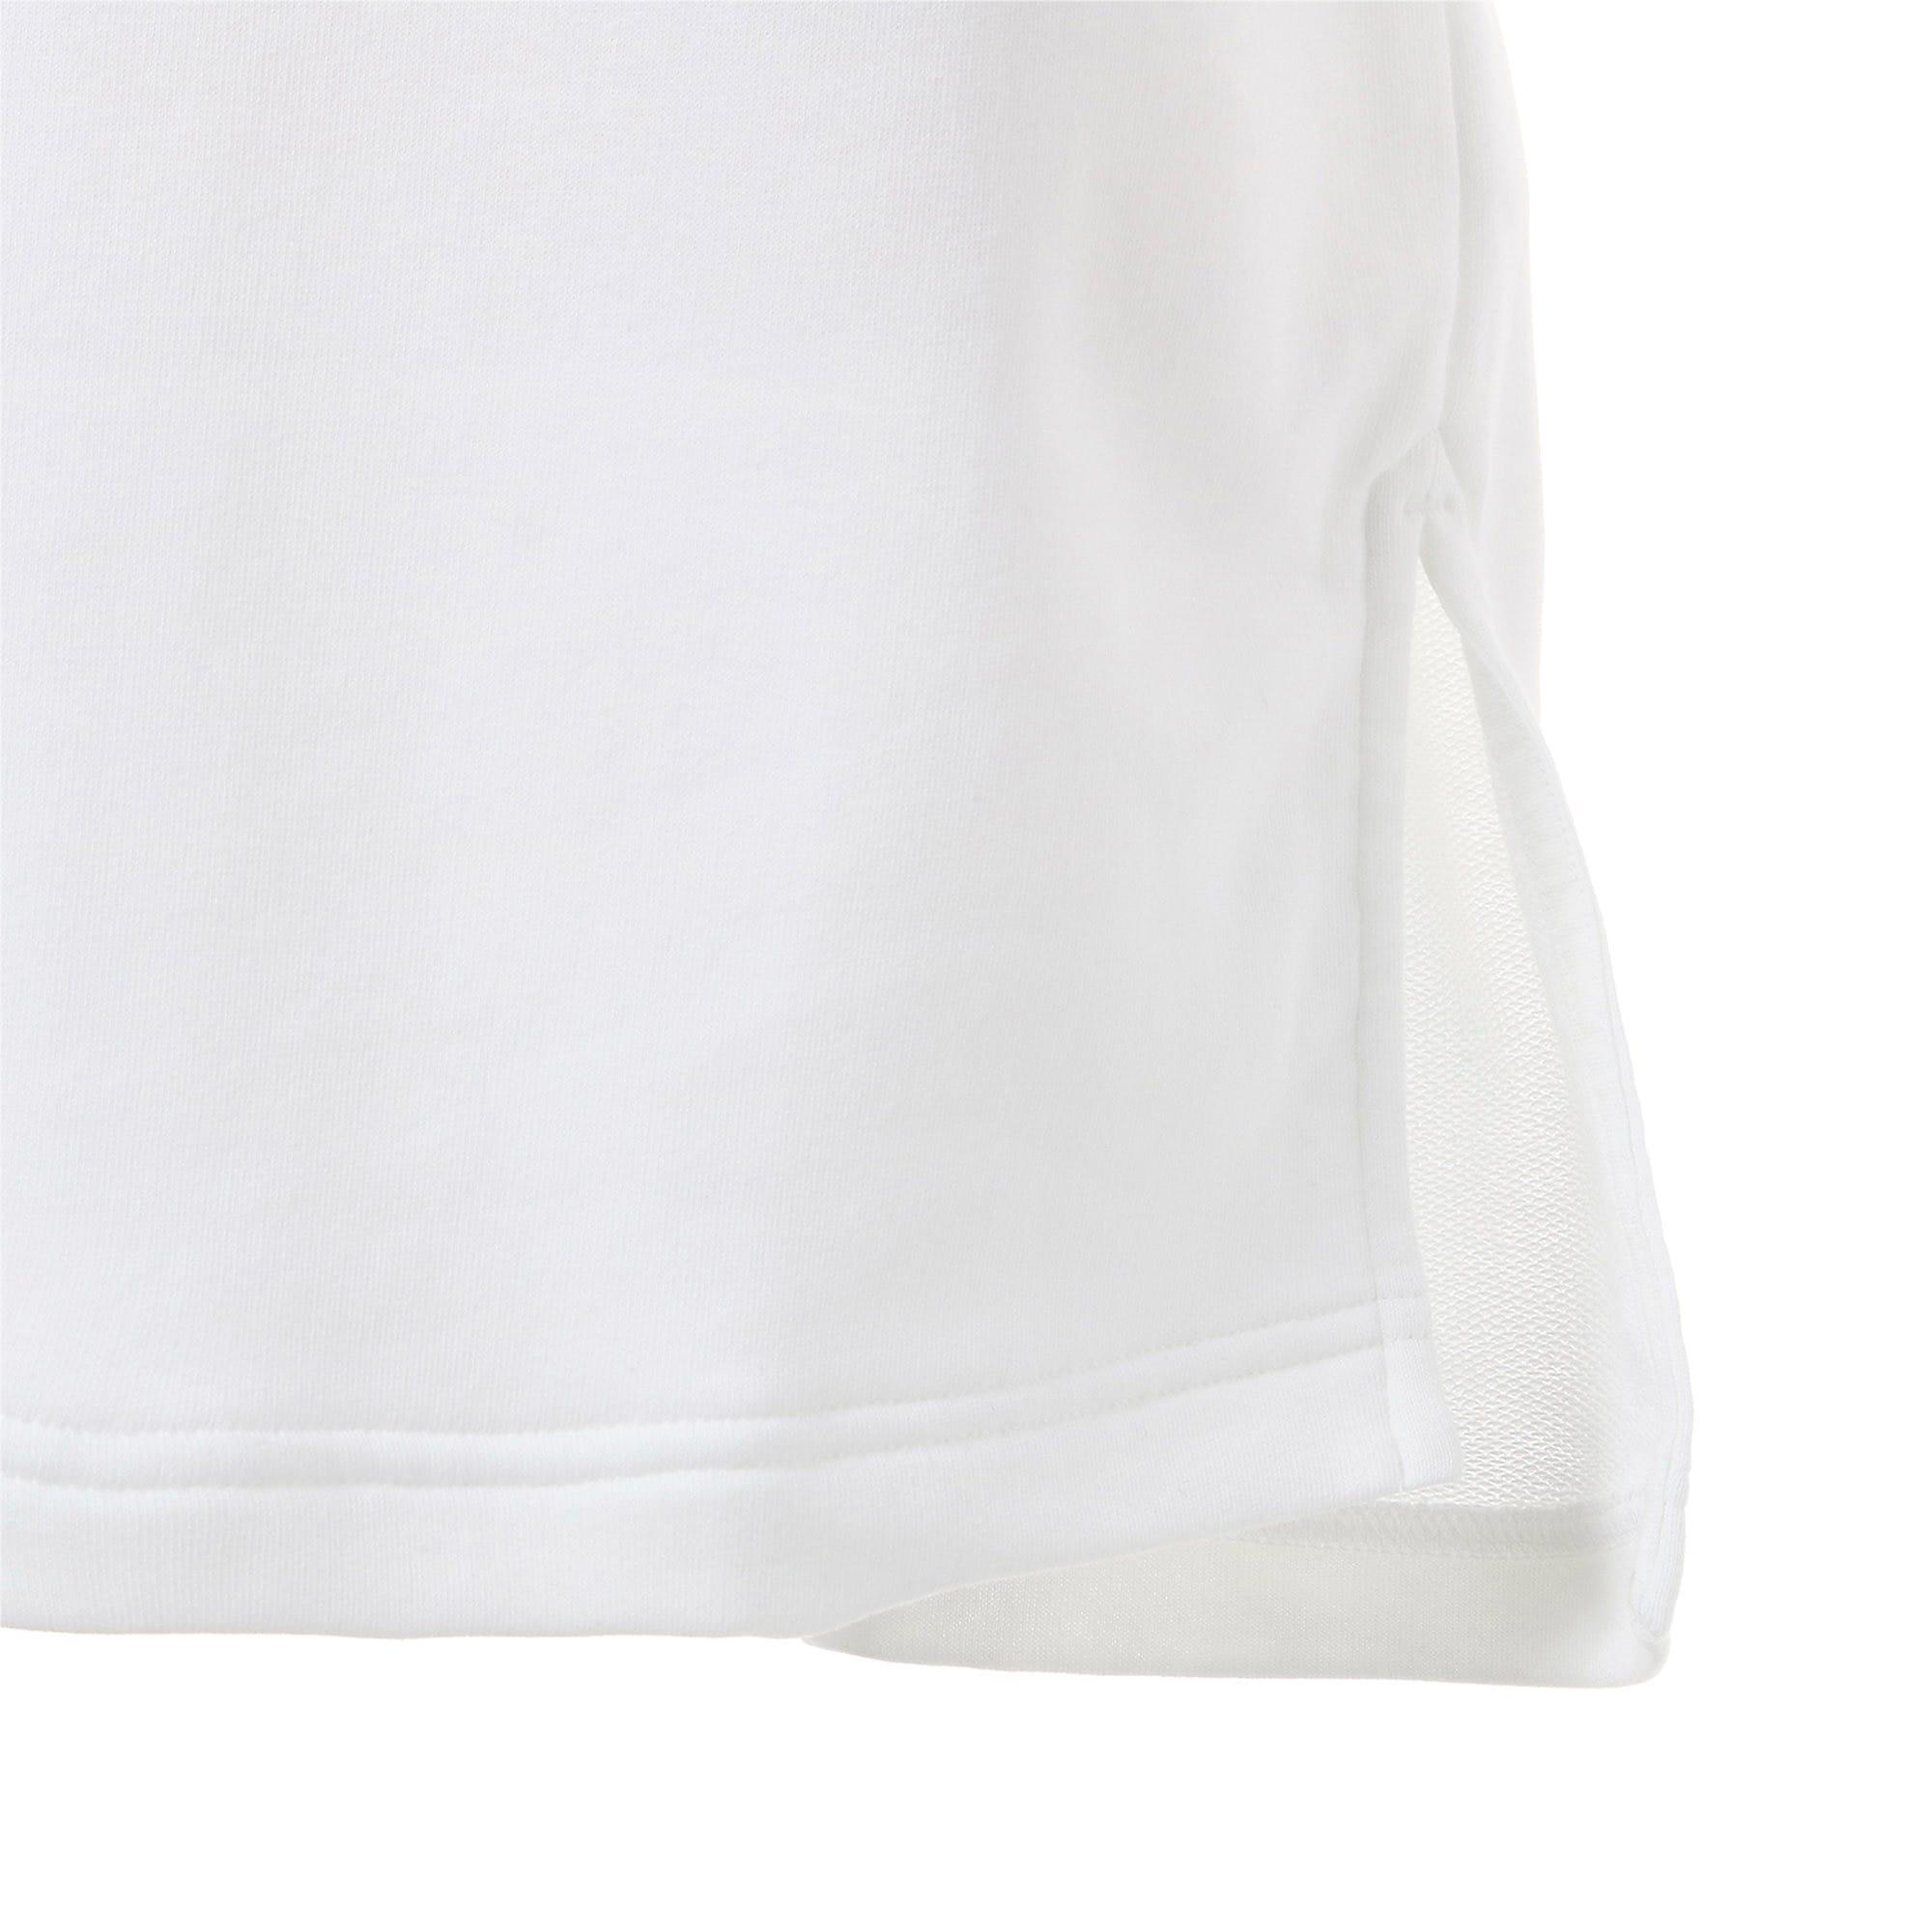 Thumbnail 9 of CHASE ウィメンズ フーデッドドレス, Puma White, medium-JPN